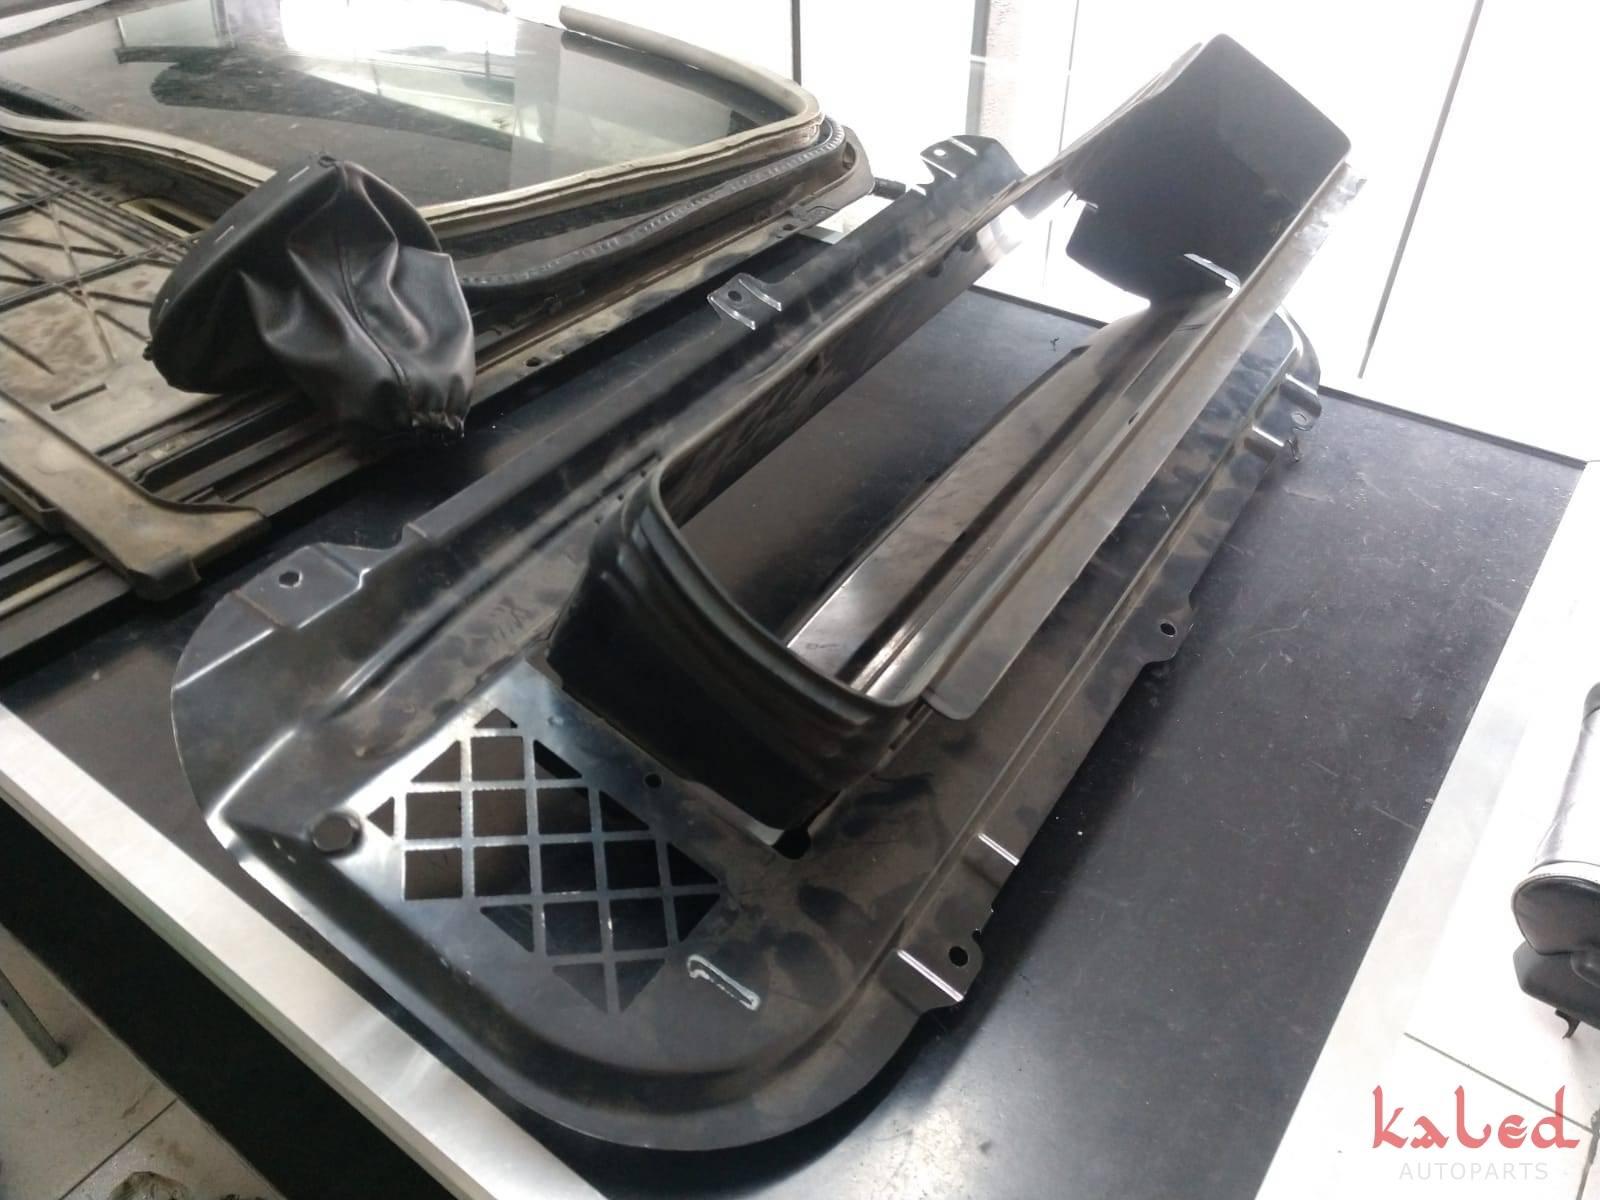 Splitter Intercooler Subaru Forester 2.0 turbo 06 a 08 - Kaled Auto Parts